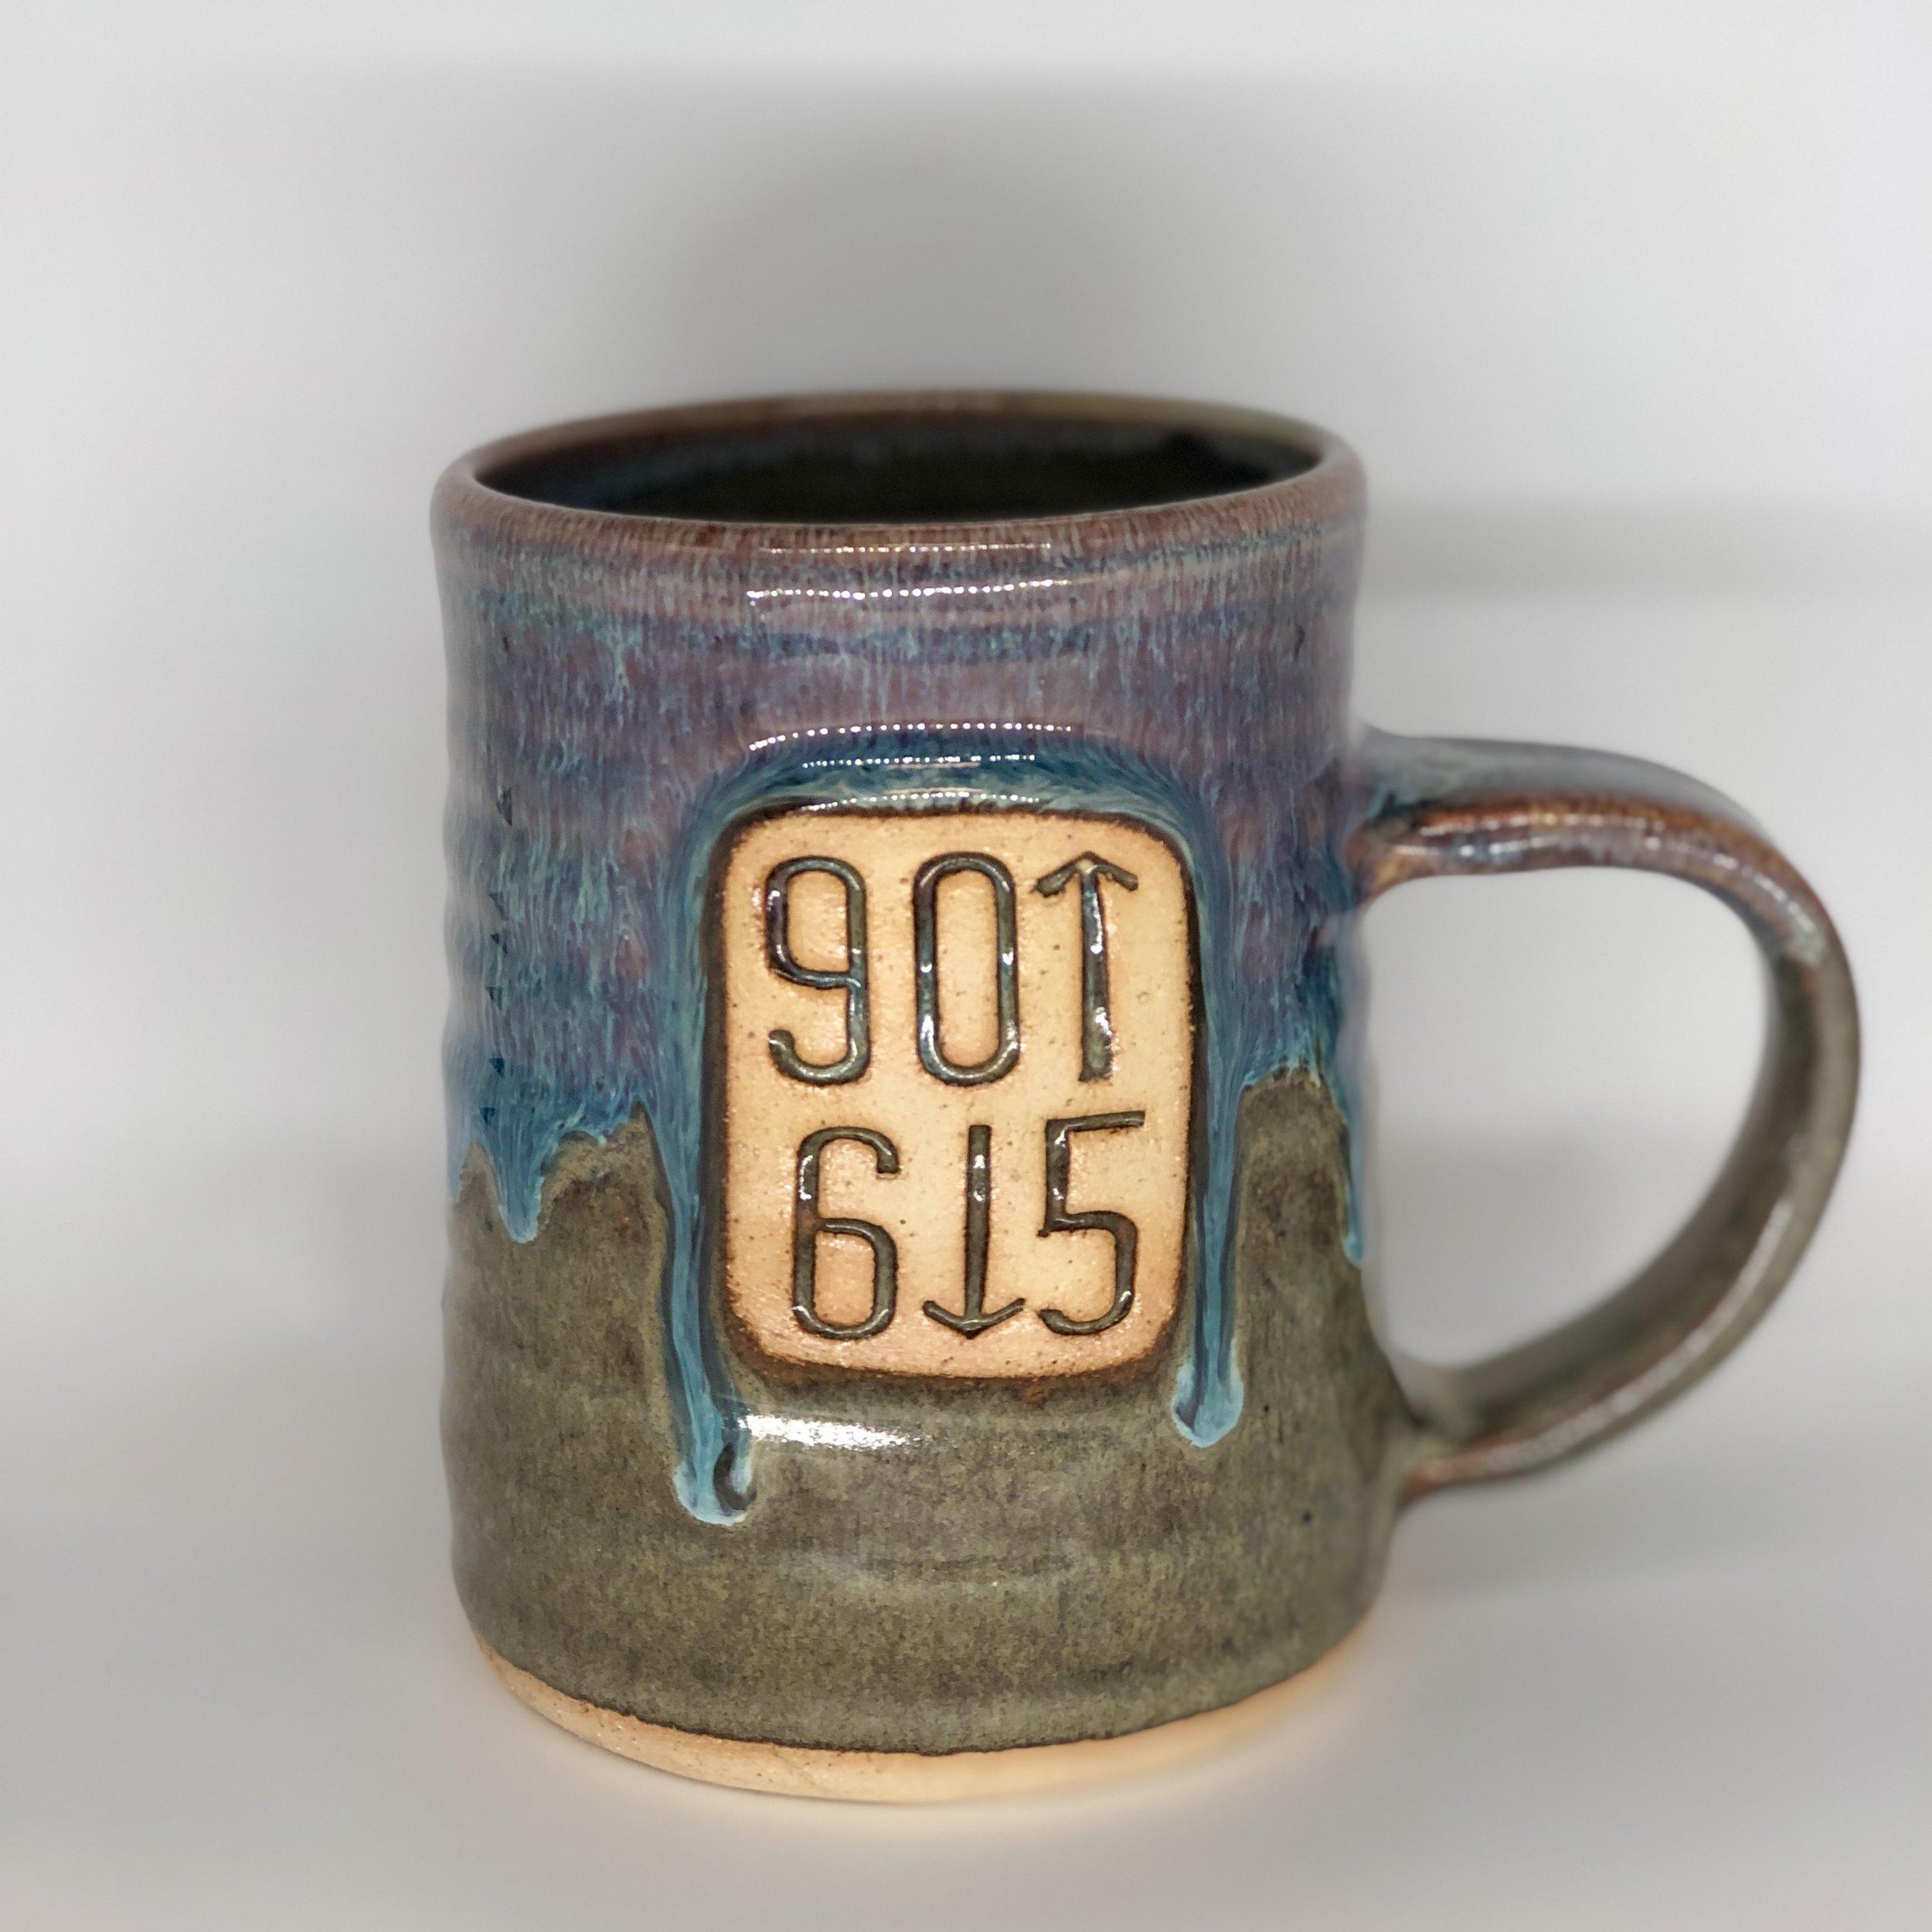 901 / 615 Mug, Tall Shape, Blue / Green Color